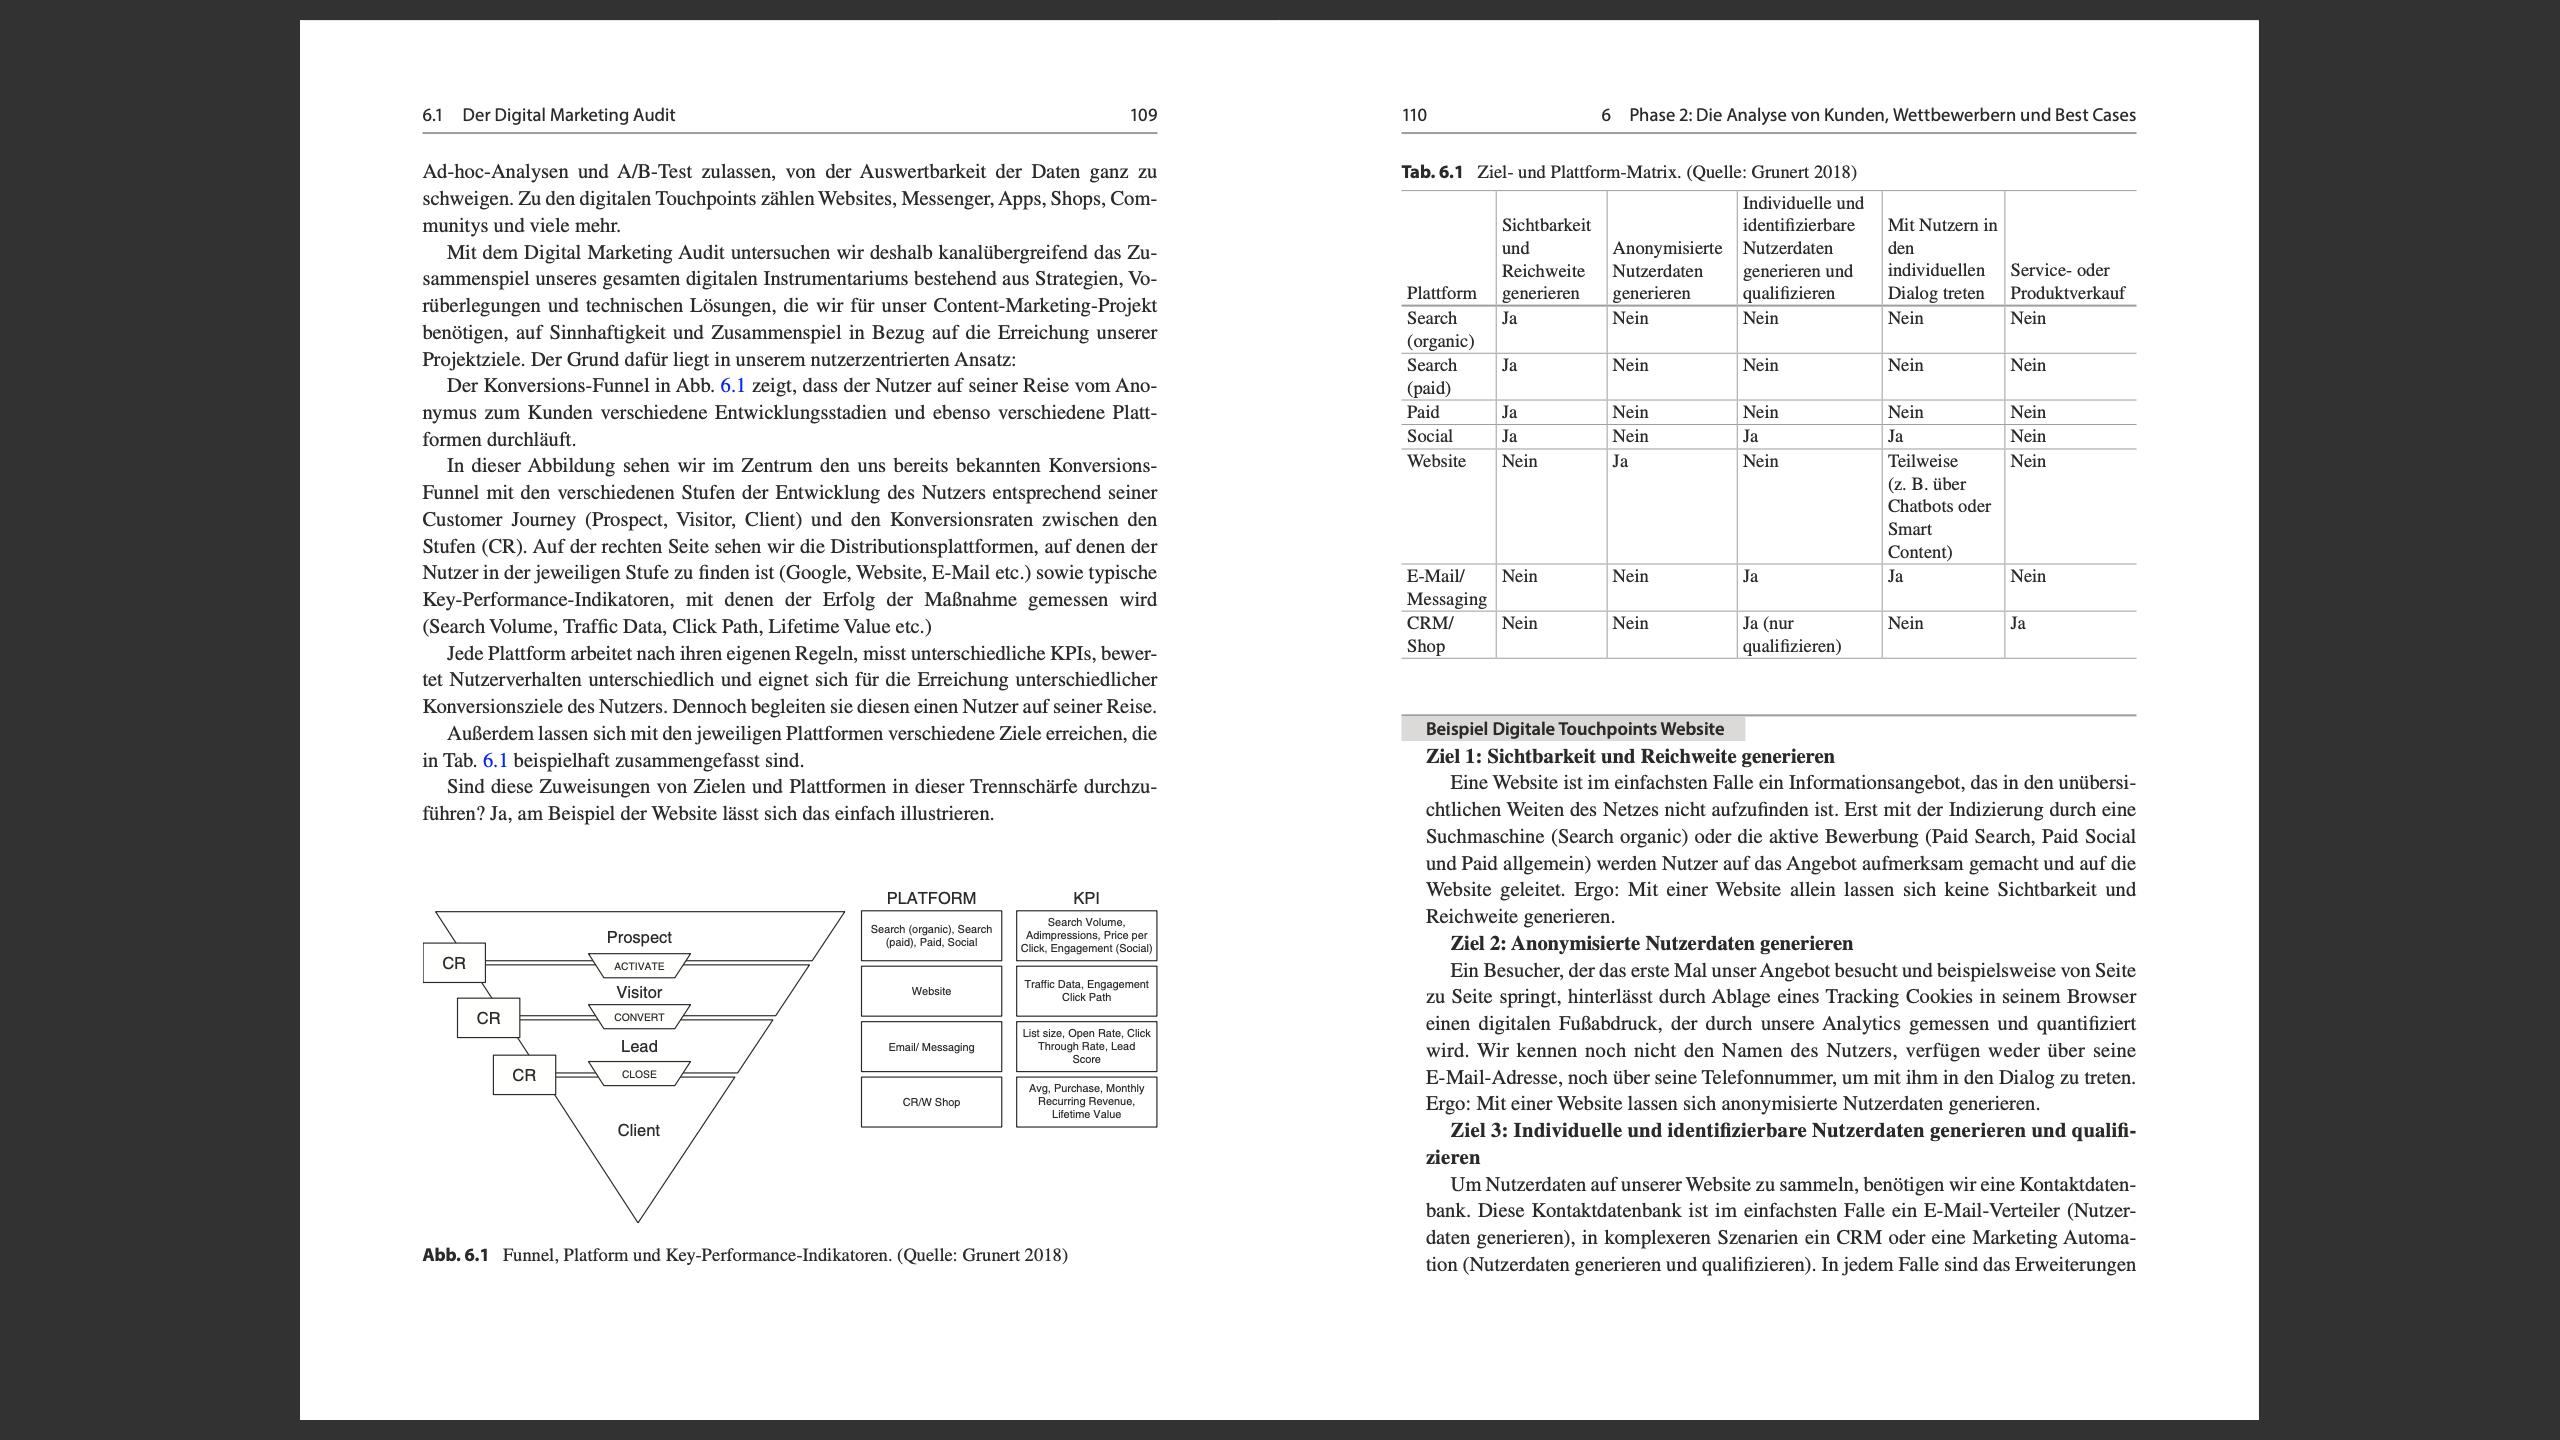 8-Methodisches-Content-Marketing-Gerrit-Grunert